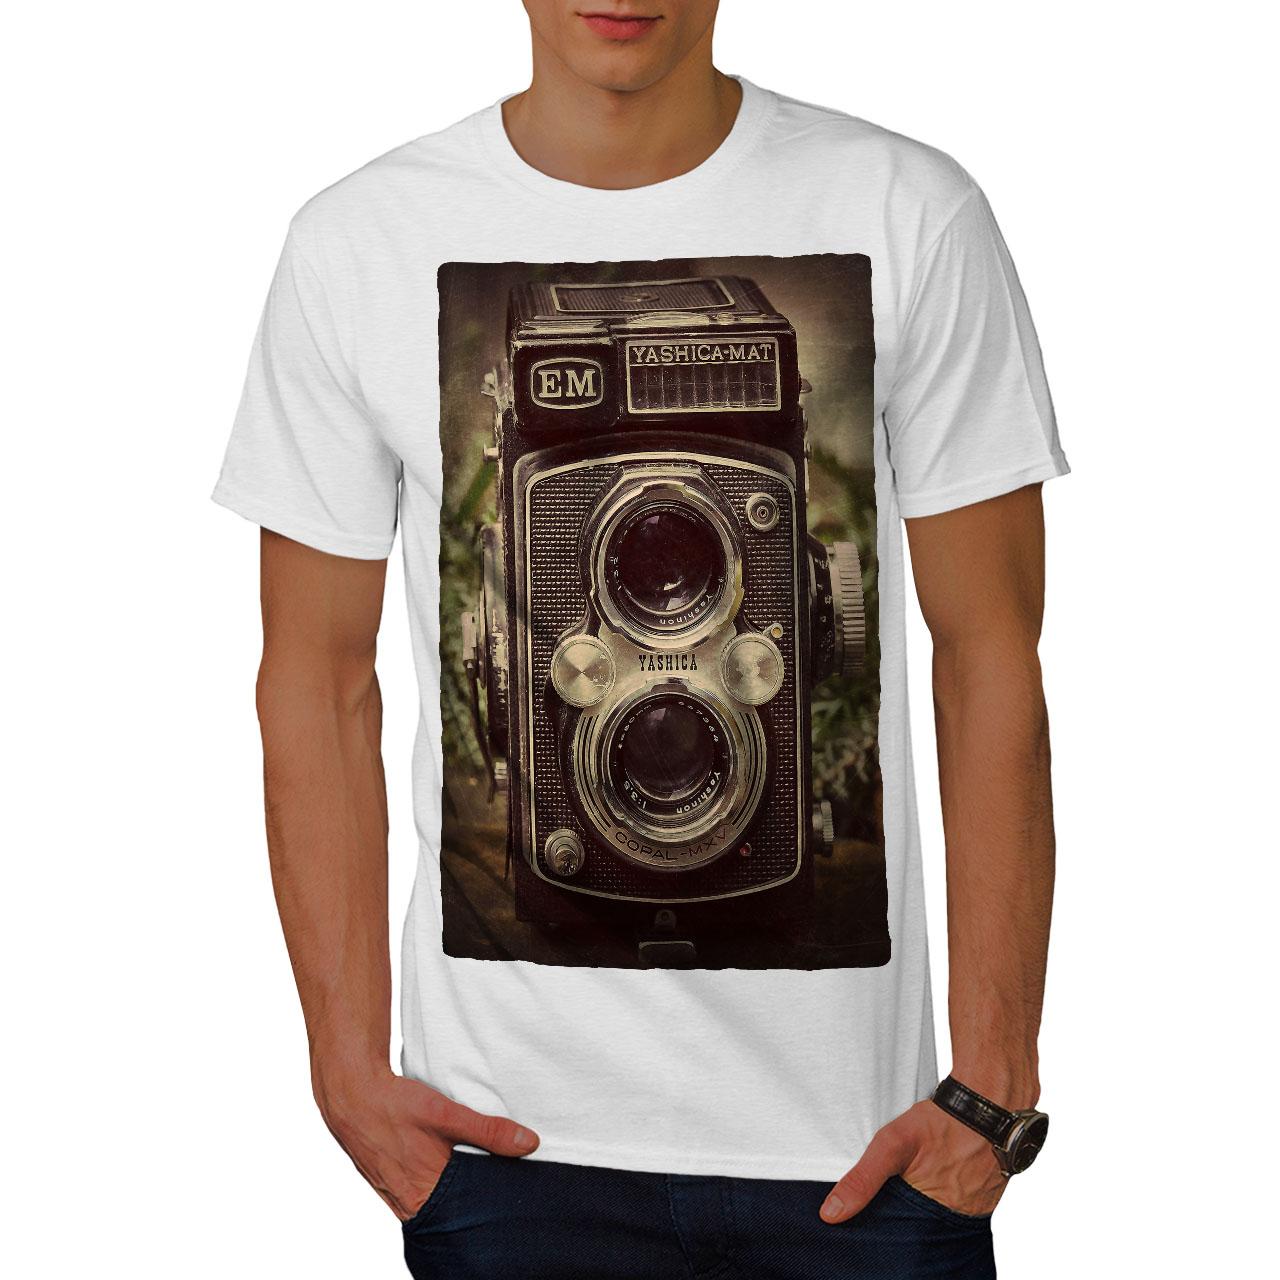 Wellcoda-Old-Foto-Camera-Mens-T-shirt-Retro-Graphic-Design-Printed-Tee thumbnail 9